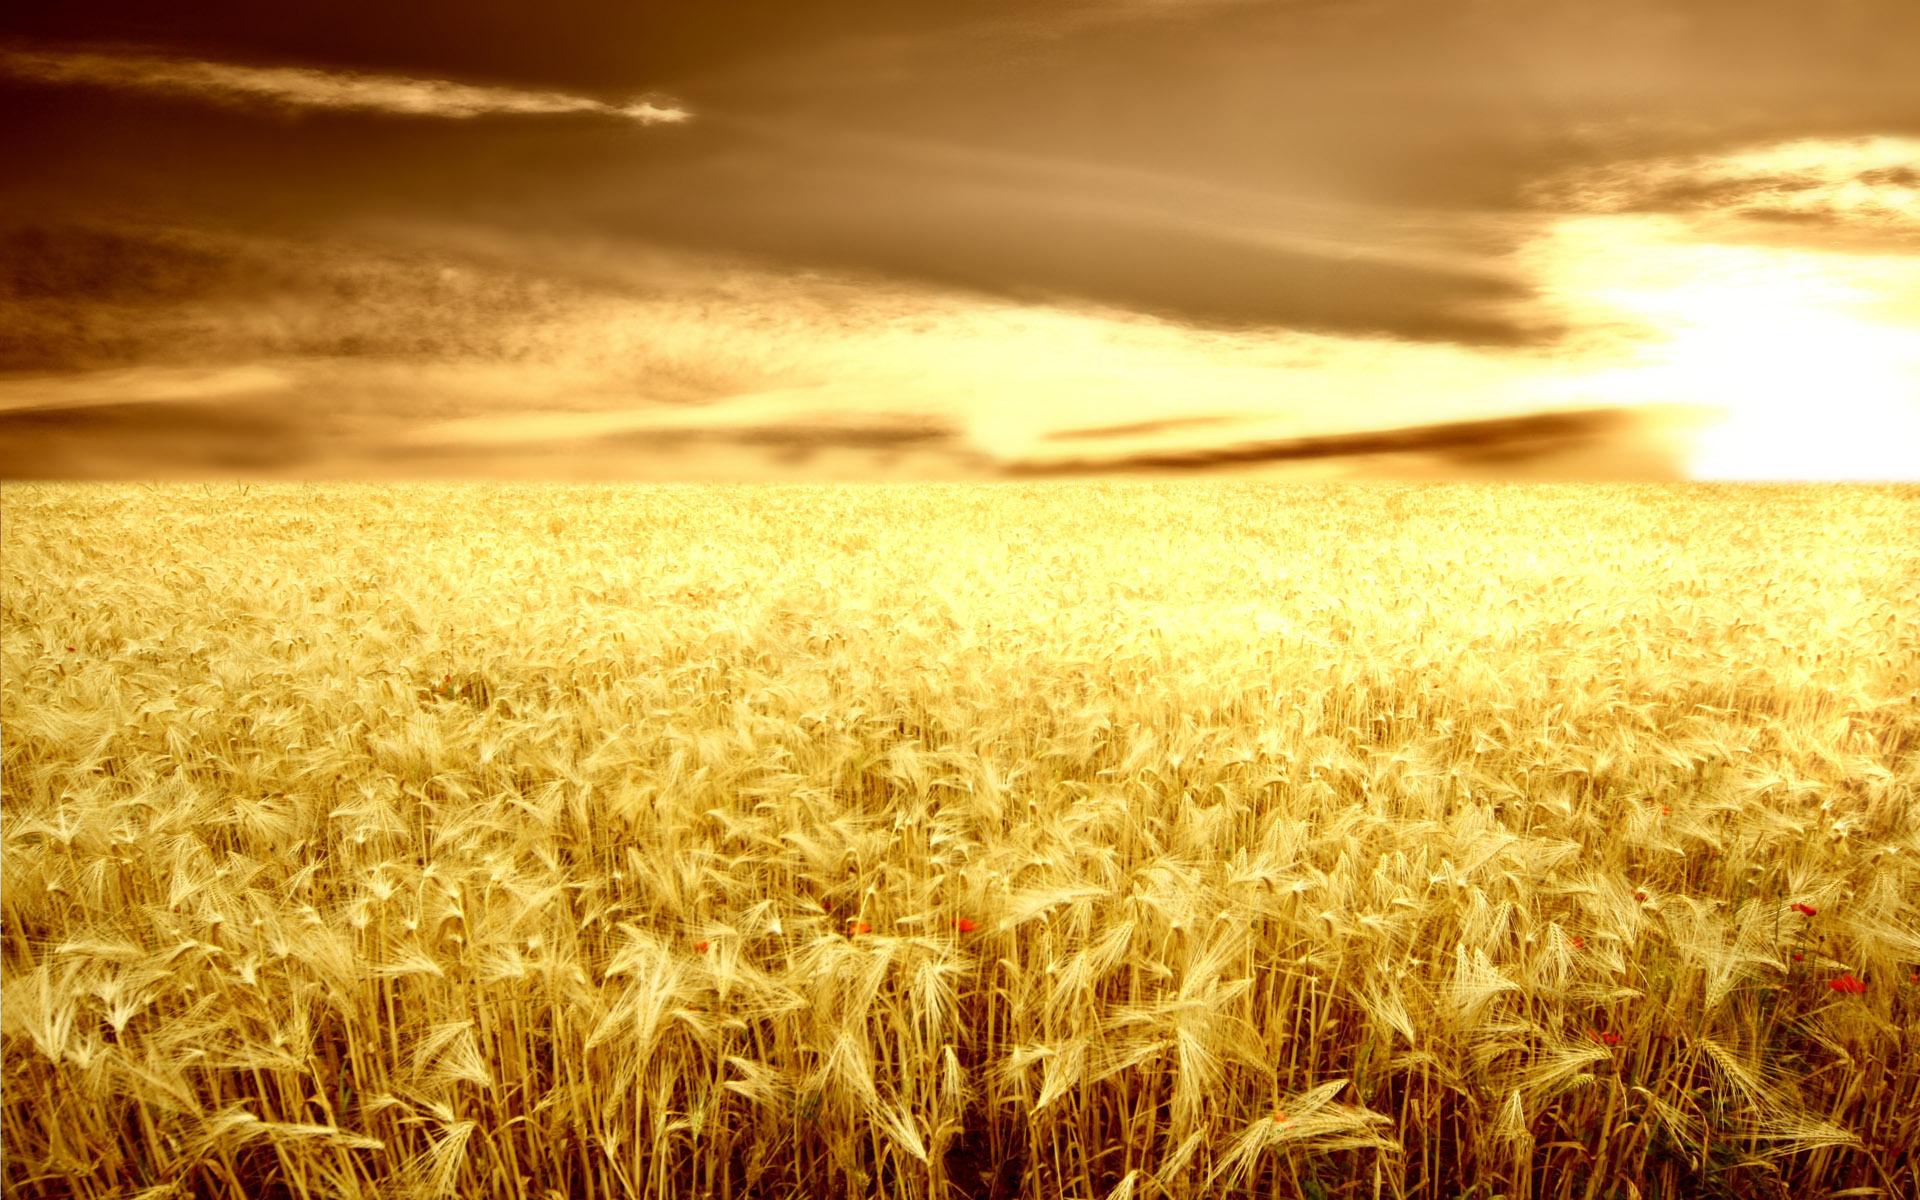 Fall Autumn Wallpaper Farming Backgrounds Download Free Pixelstalk Net